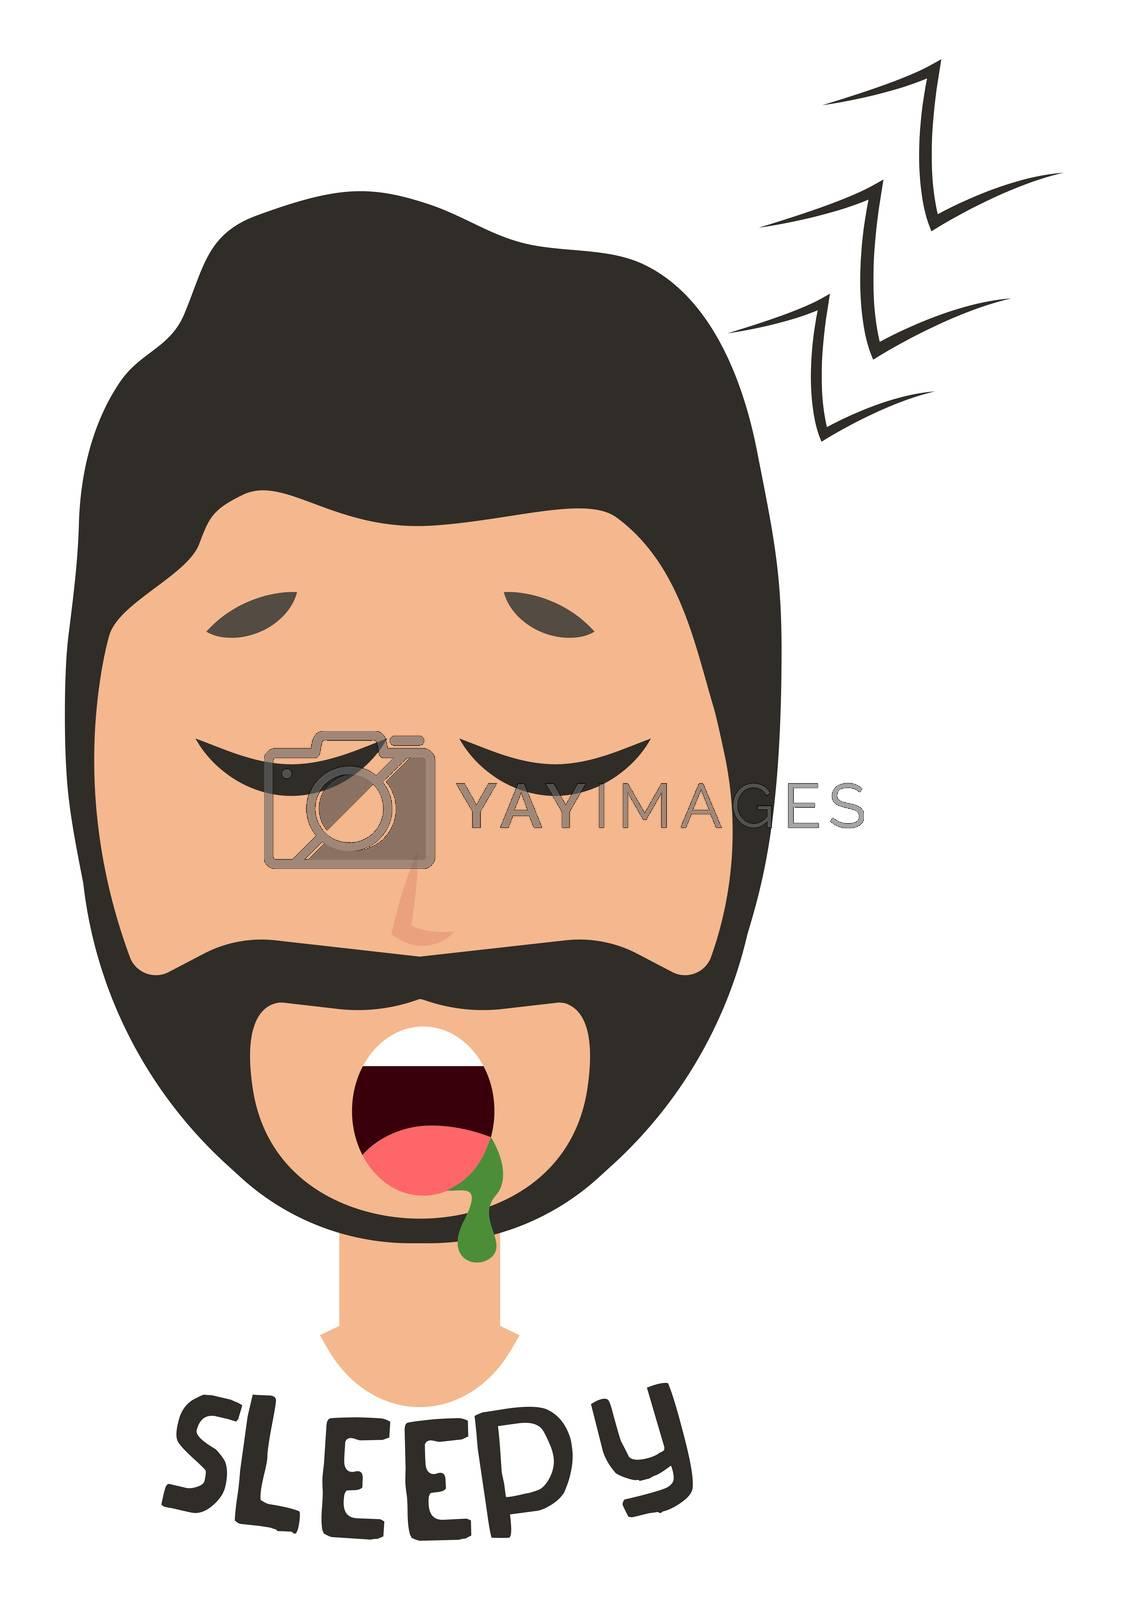 Sleepy man emoji, illustration, vector on white background